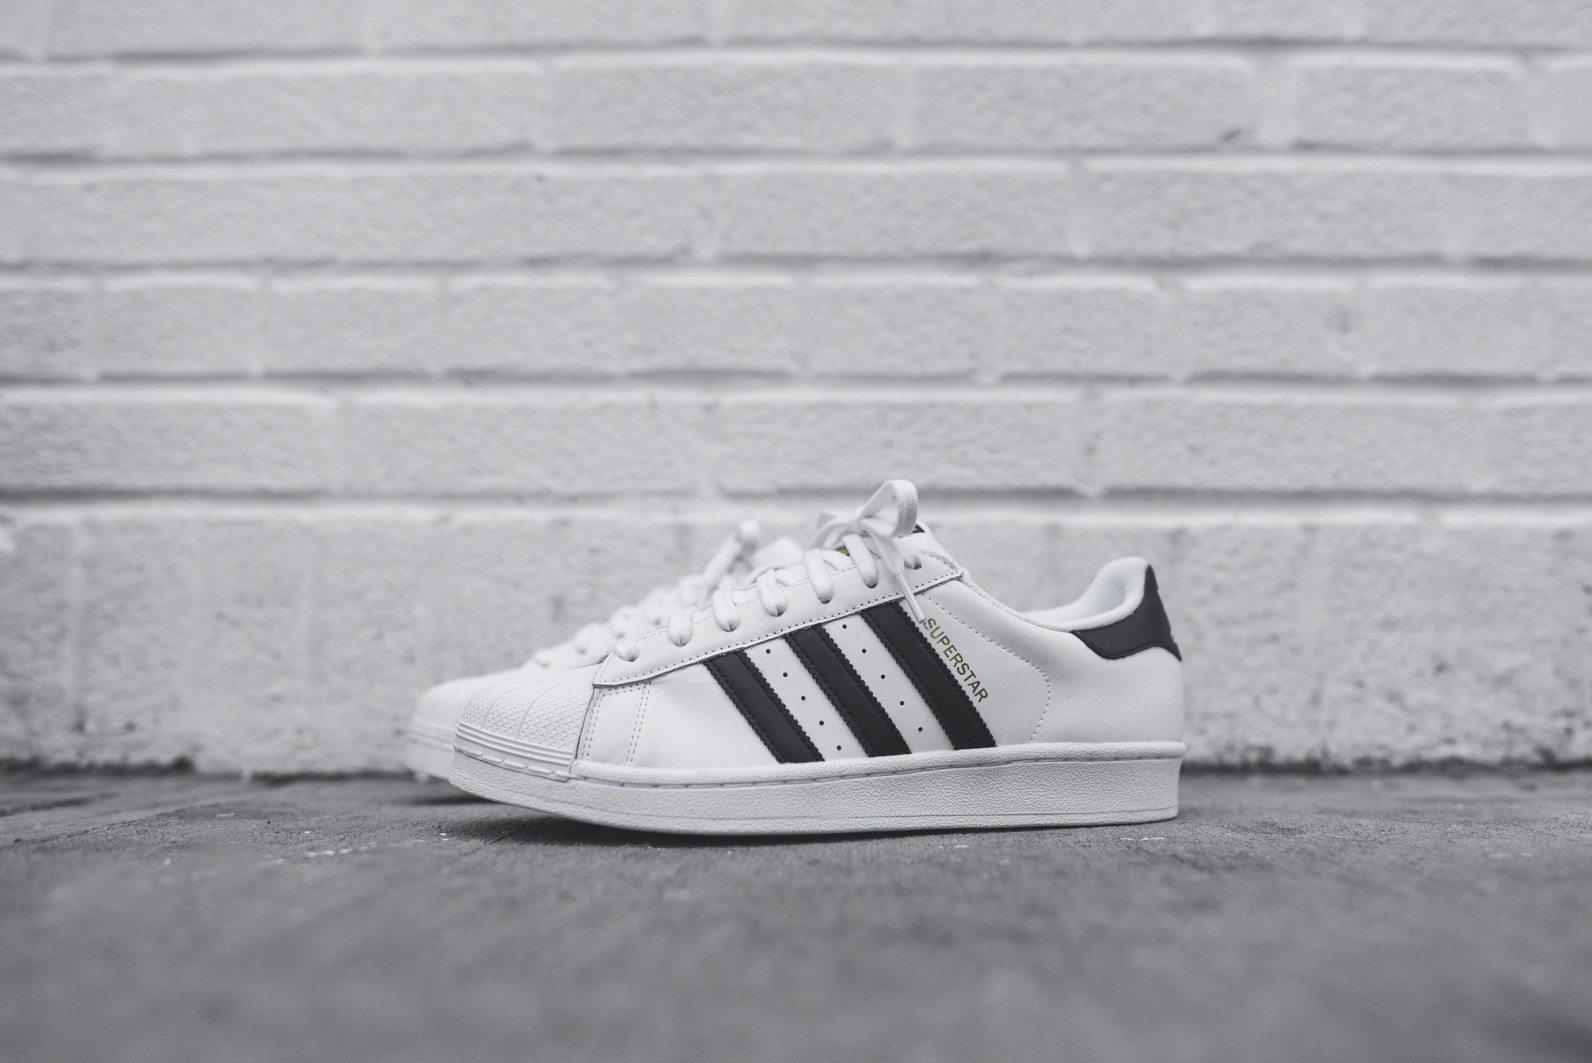 adidas Originals Superstar White Black 3